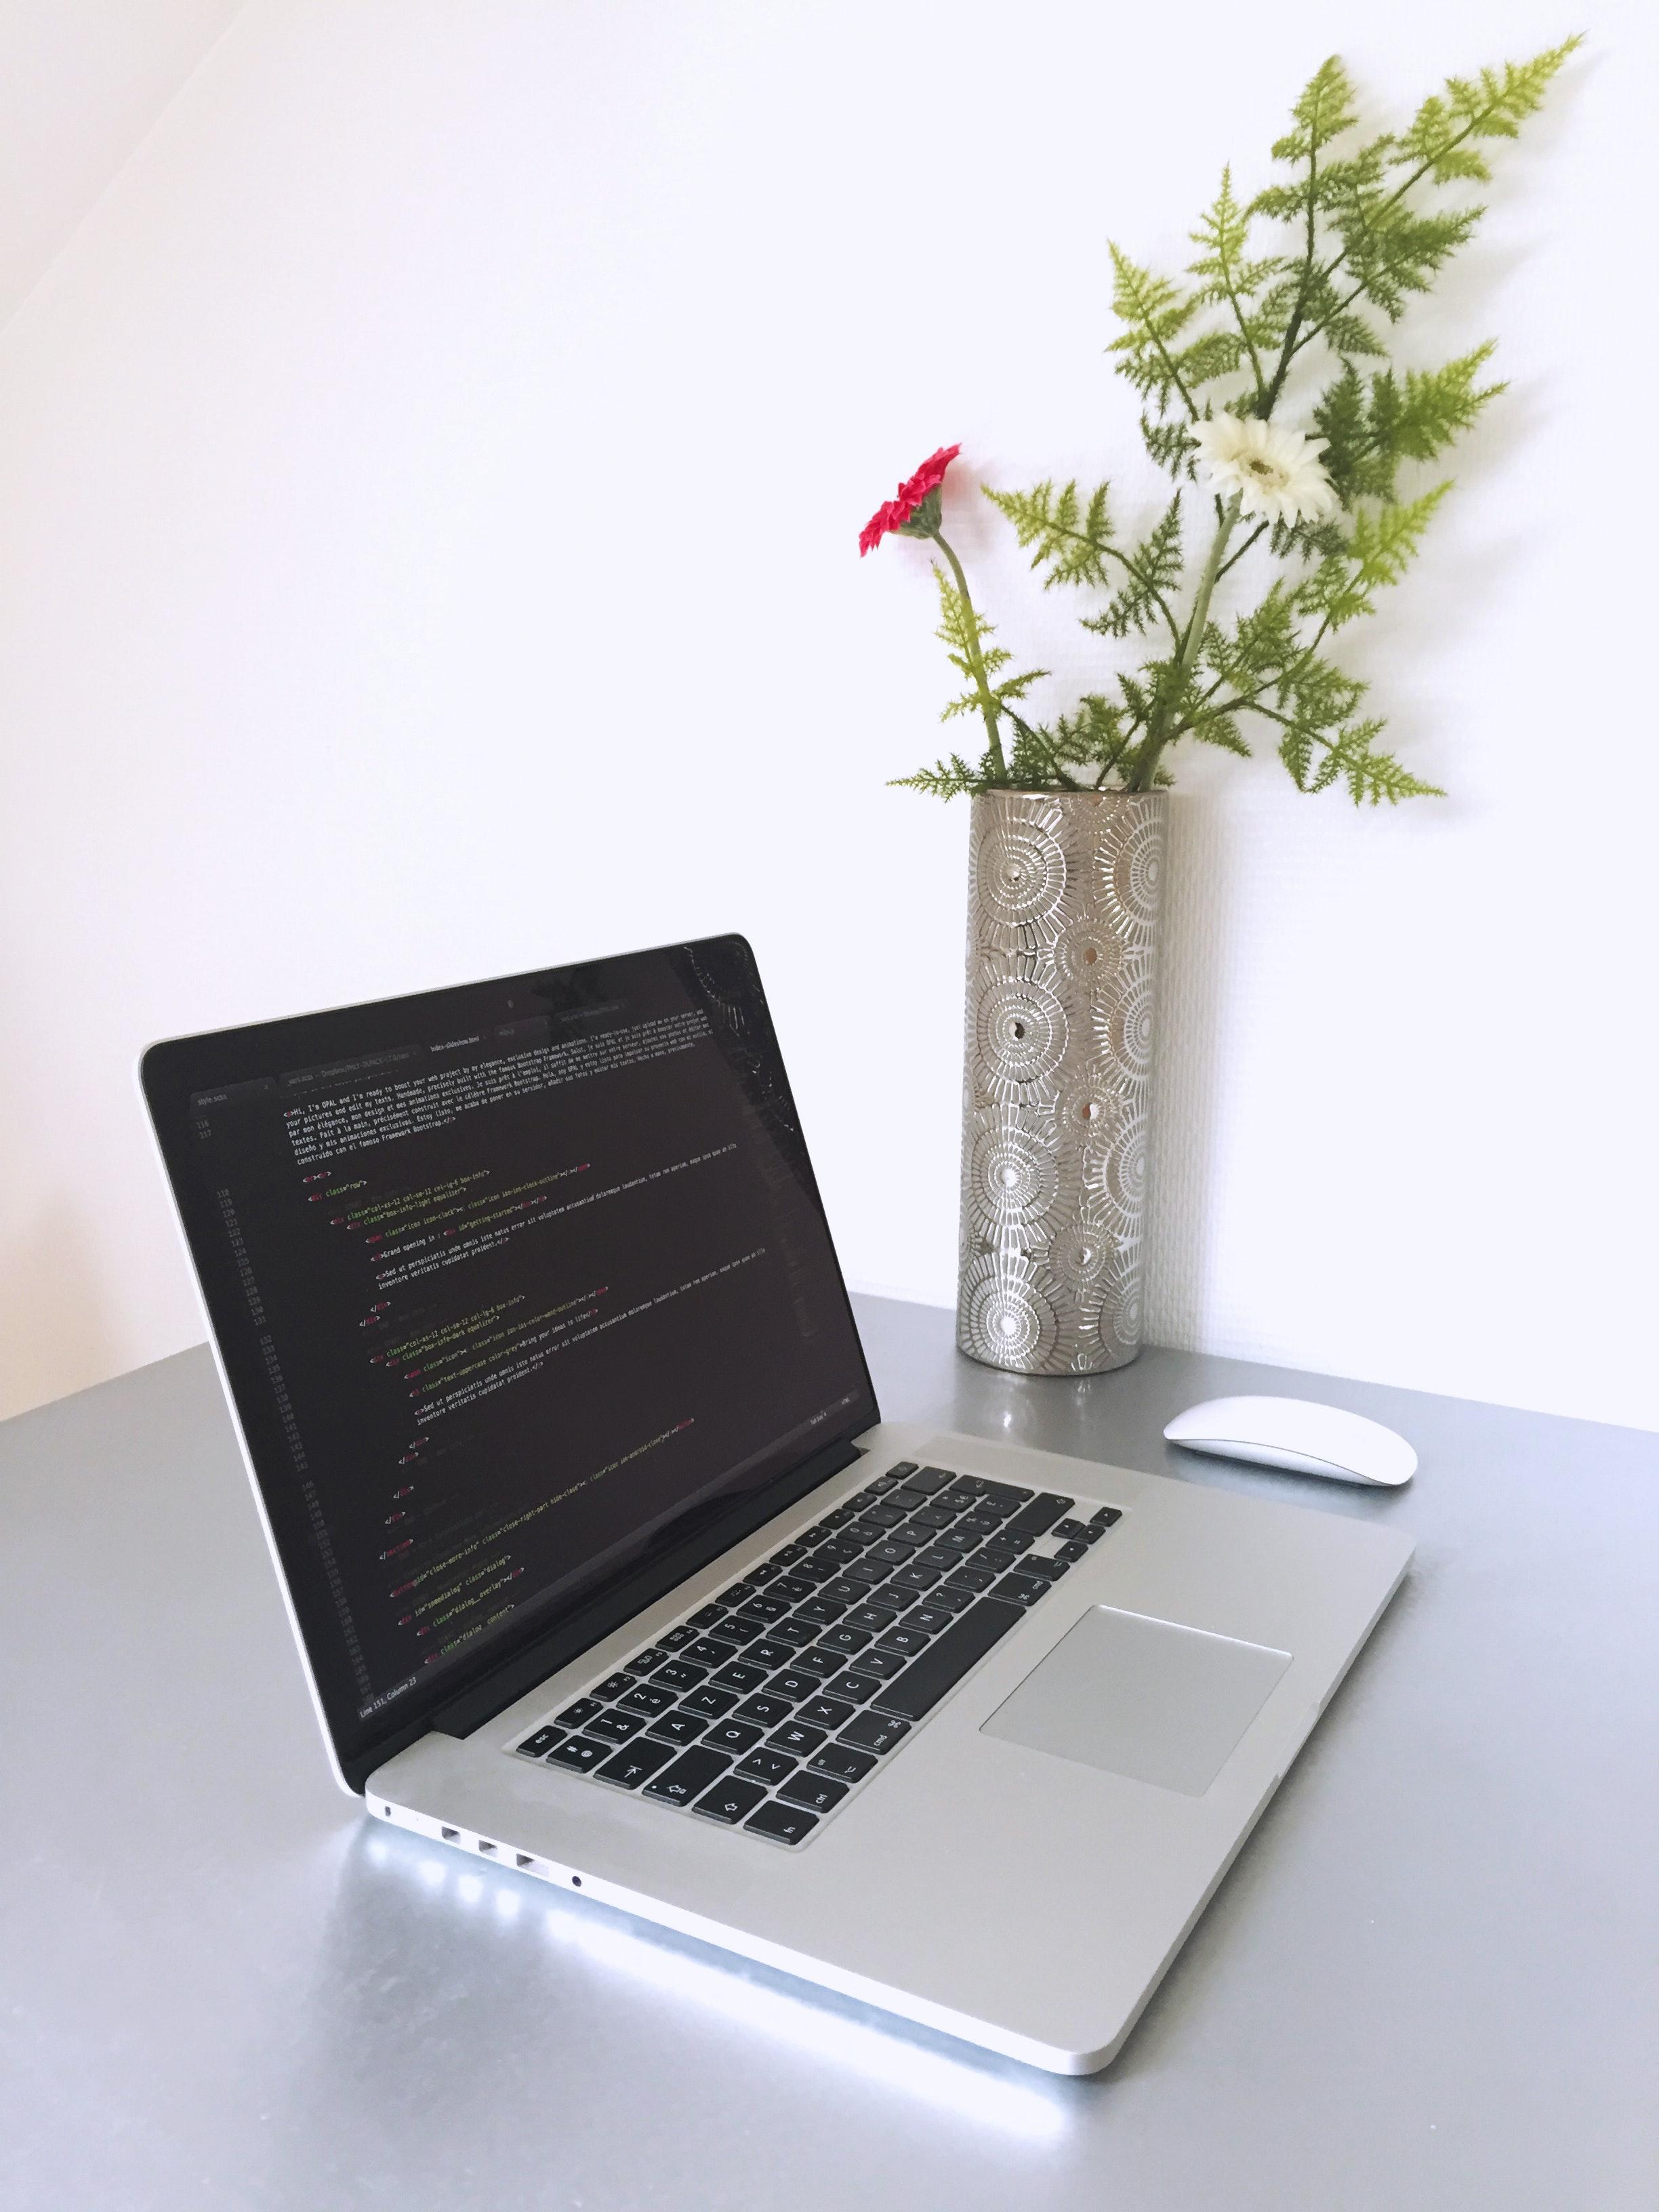 Macbook Pro, Code, Coding, Computer, Laptop, HQ Photo